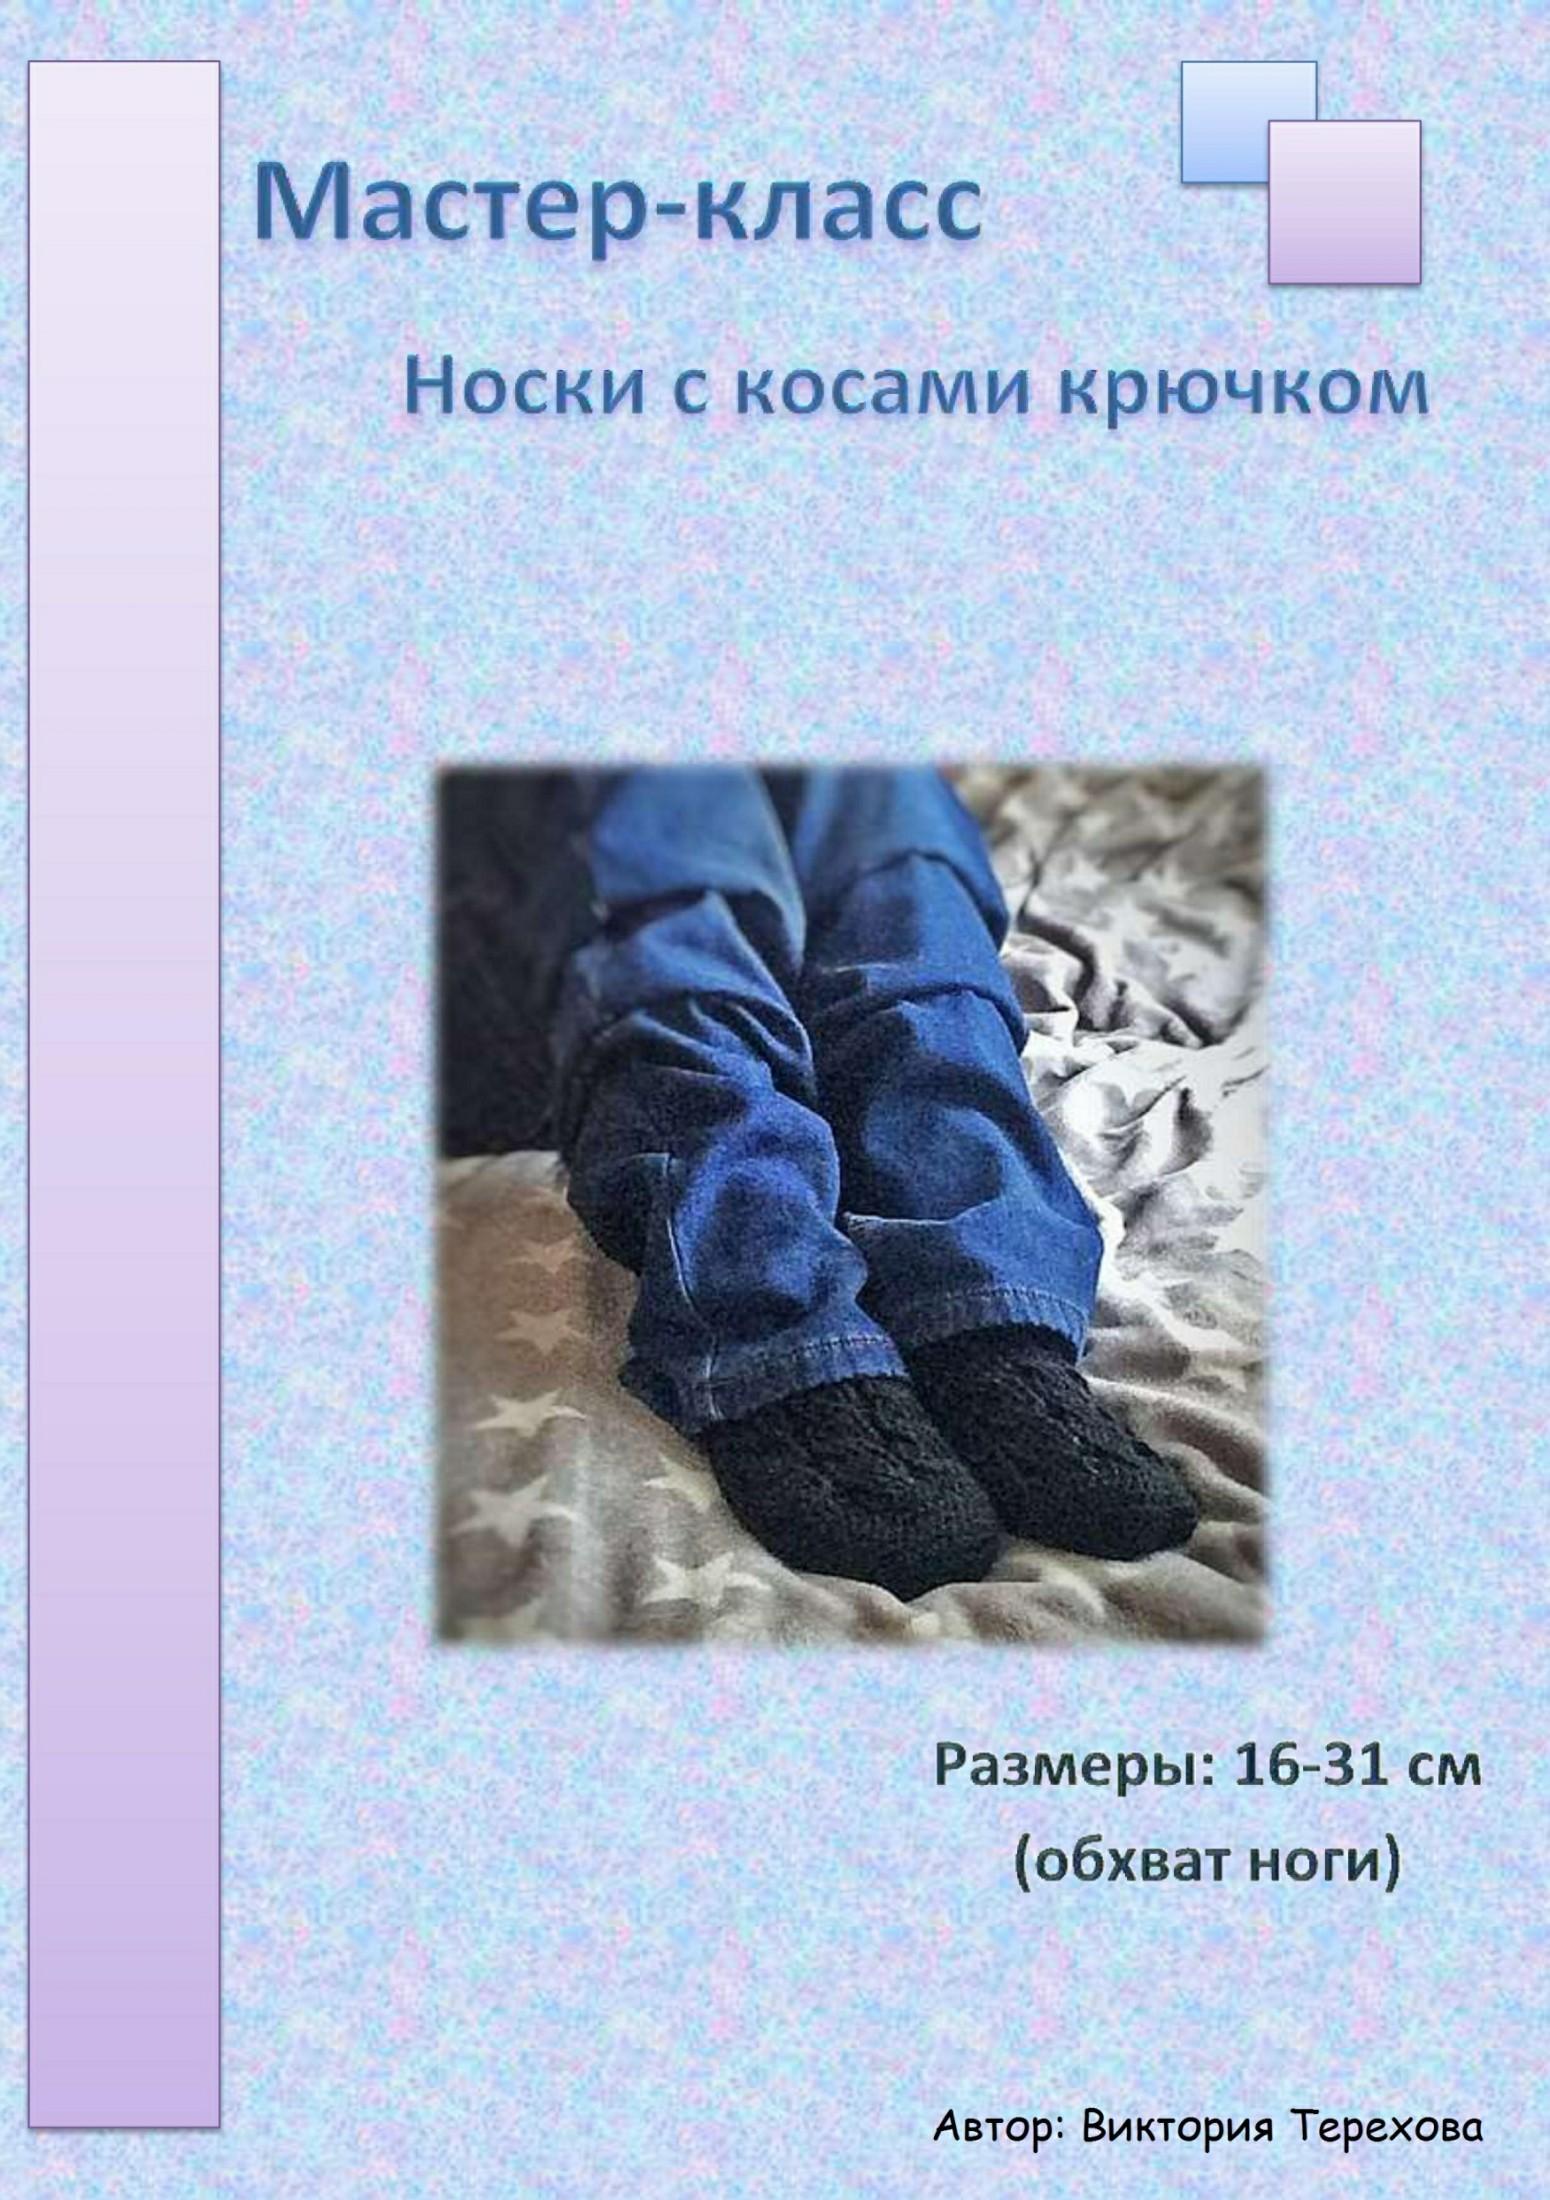 Виктория Терехова - Мастер-класс: Носки с косами крючком